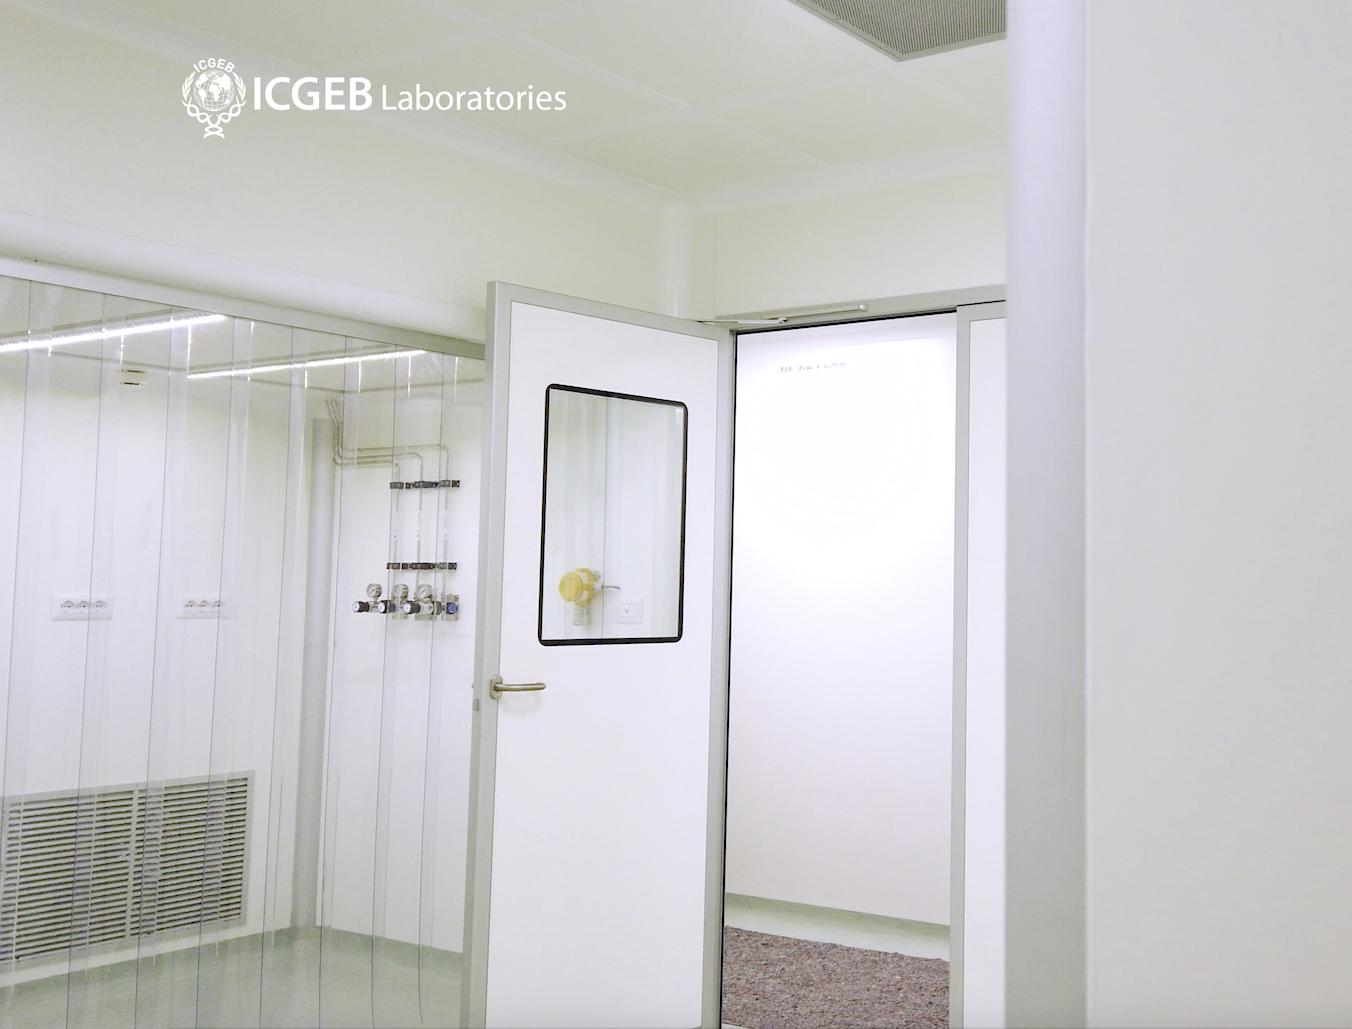 Inauguration of the ICGEB Biotech Development labs, Trieste